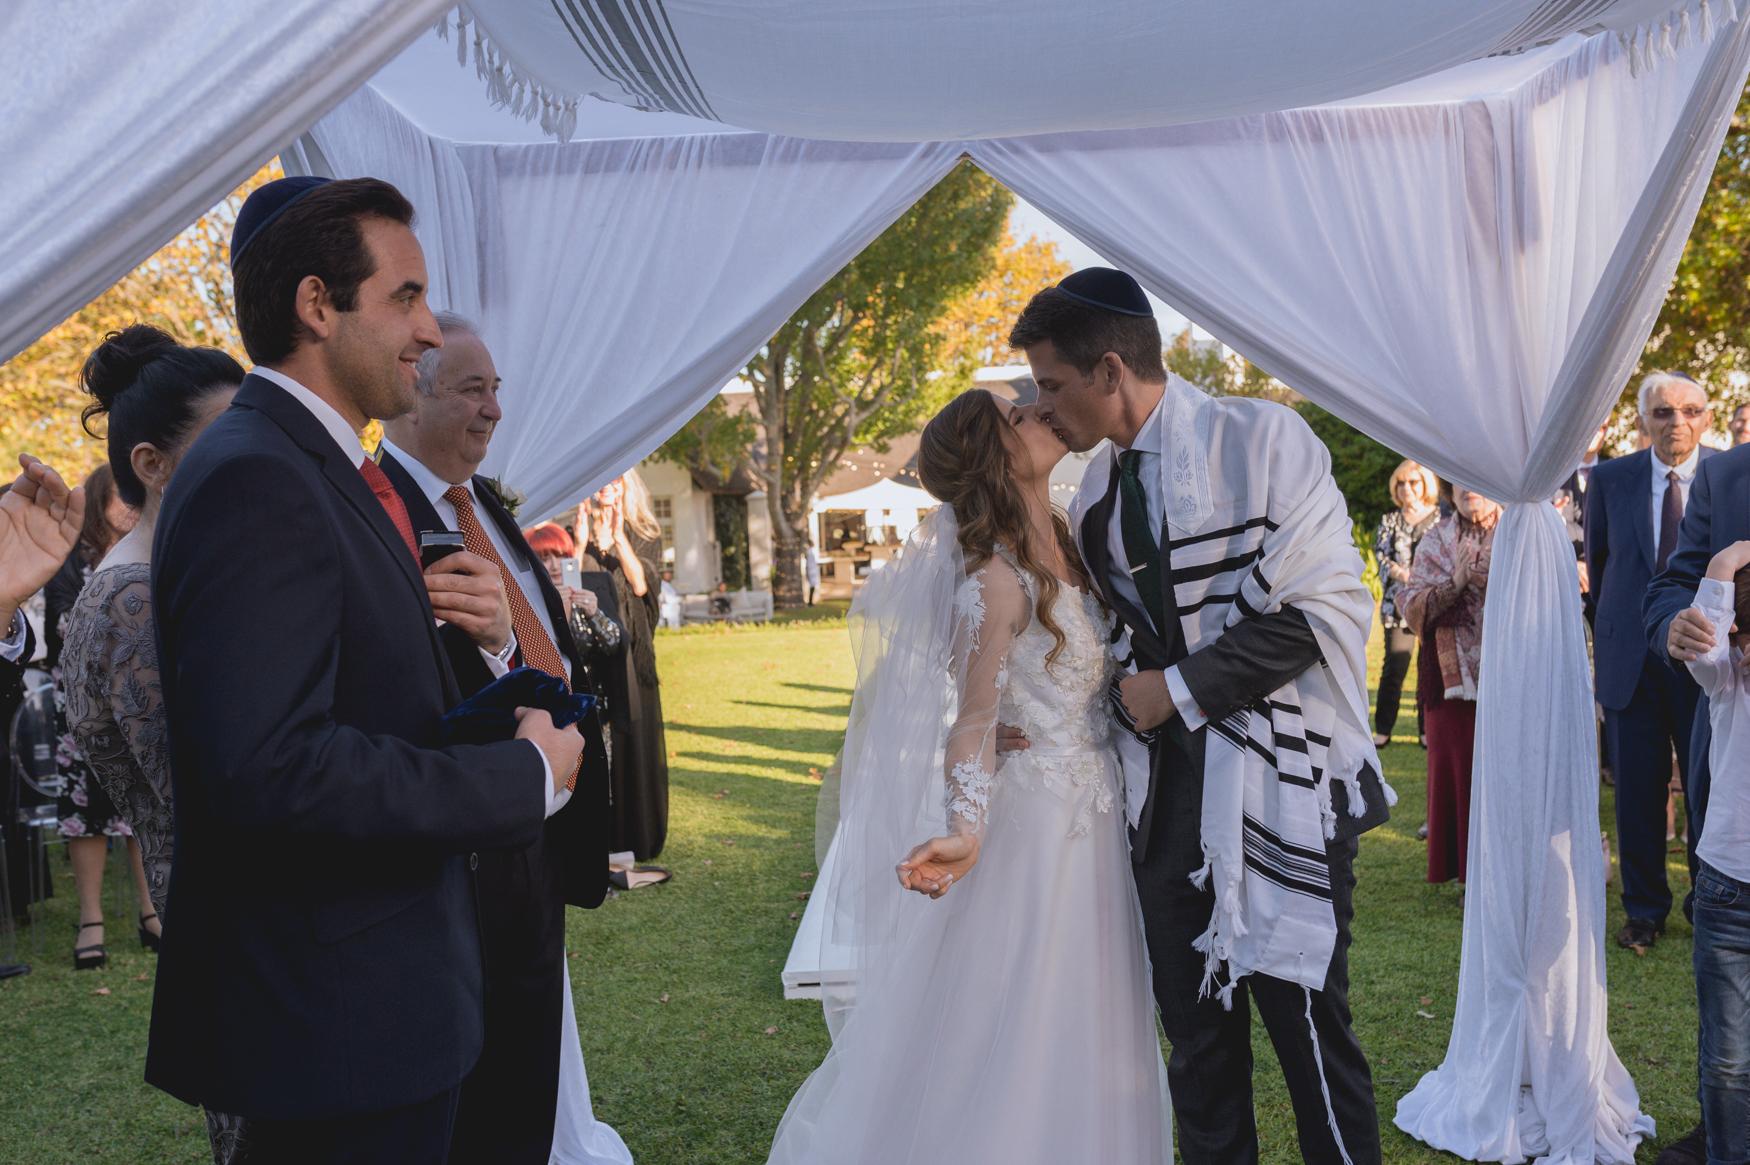 Leon_&_Martine's_Wedding_Photographs_17th_April_2019_@johnhenryweddingphoto_Low_Resolution_Web-337.JPG